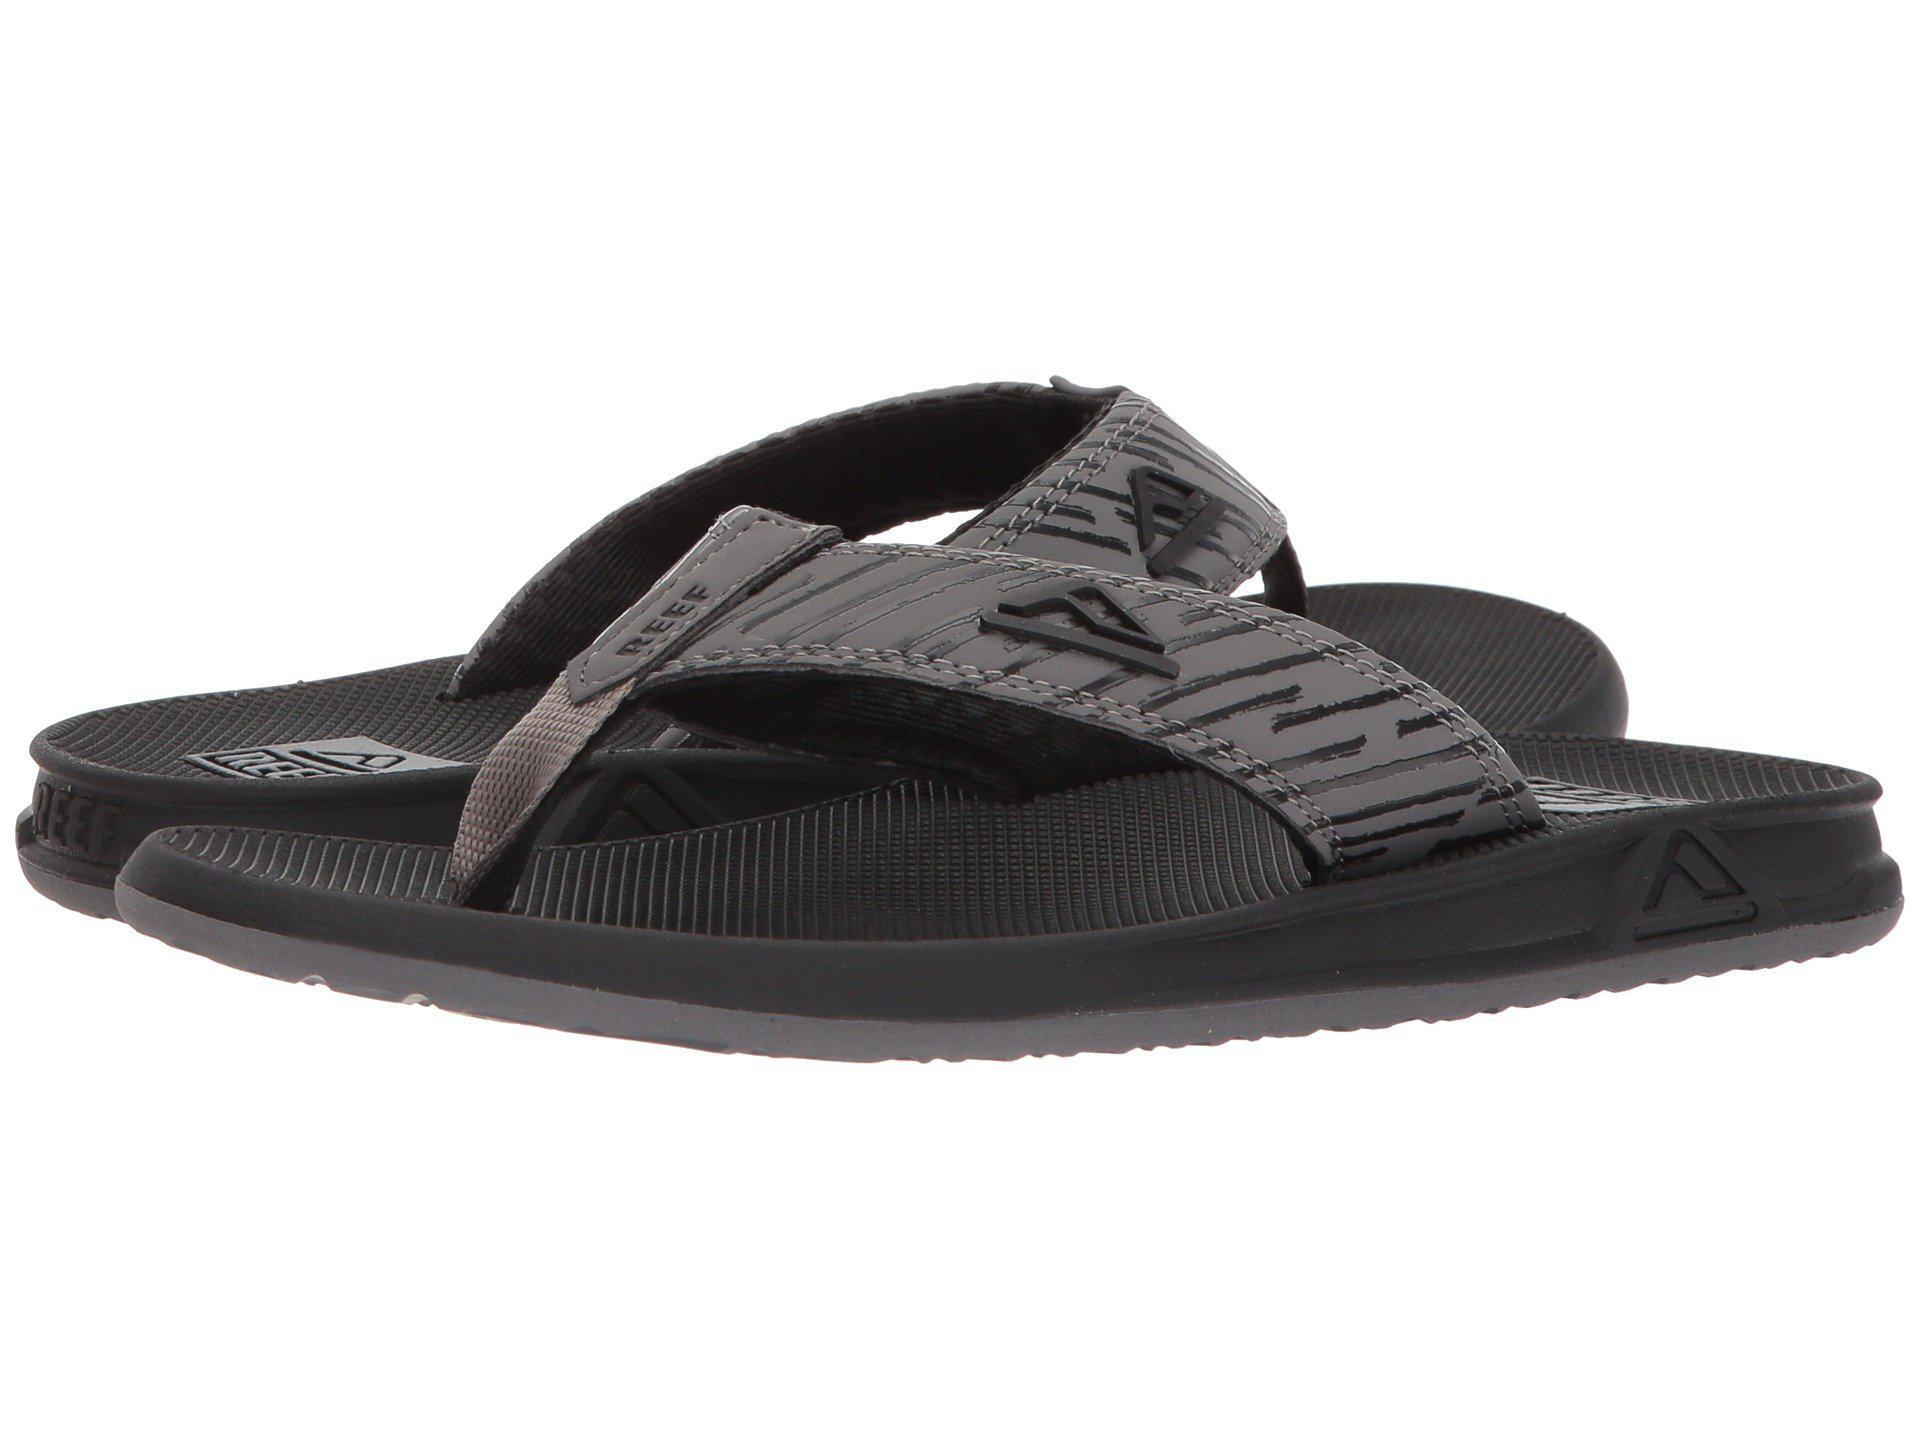 3cd2386b2cf4 Lyst - Reef Phantom Prints (grey Lines) Men s Sandals in Black for Men